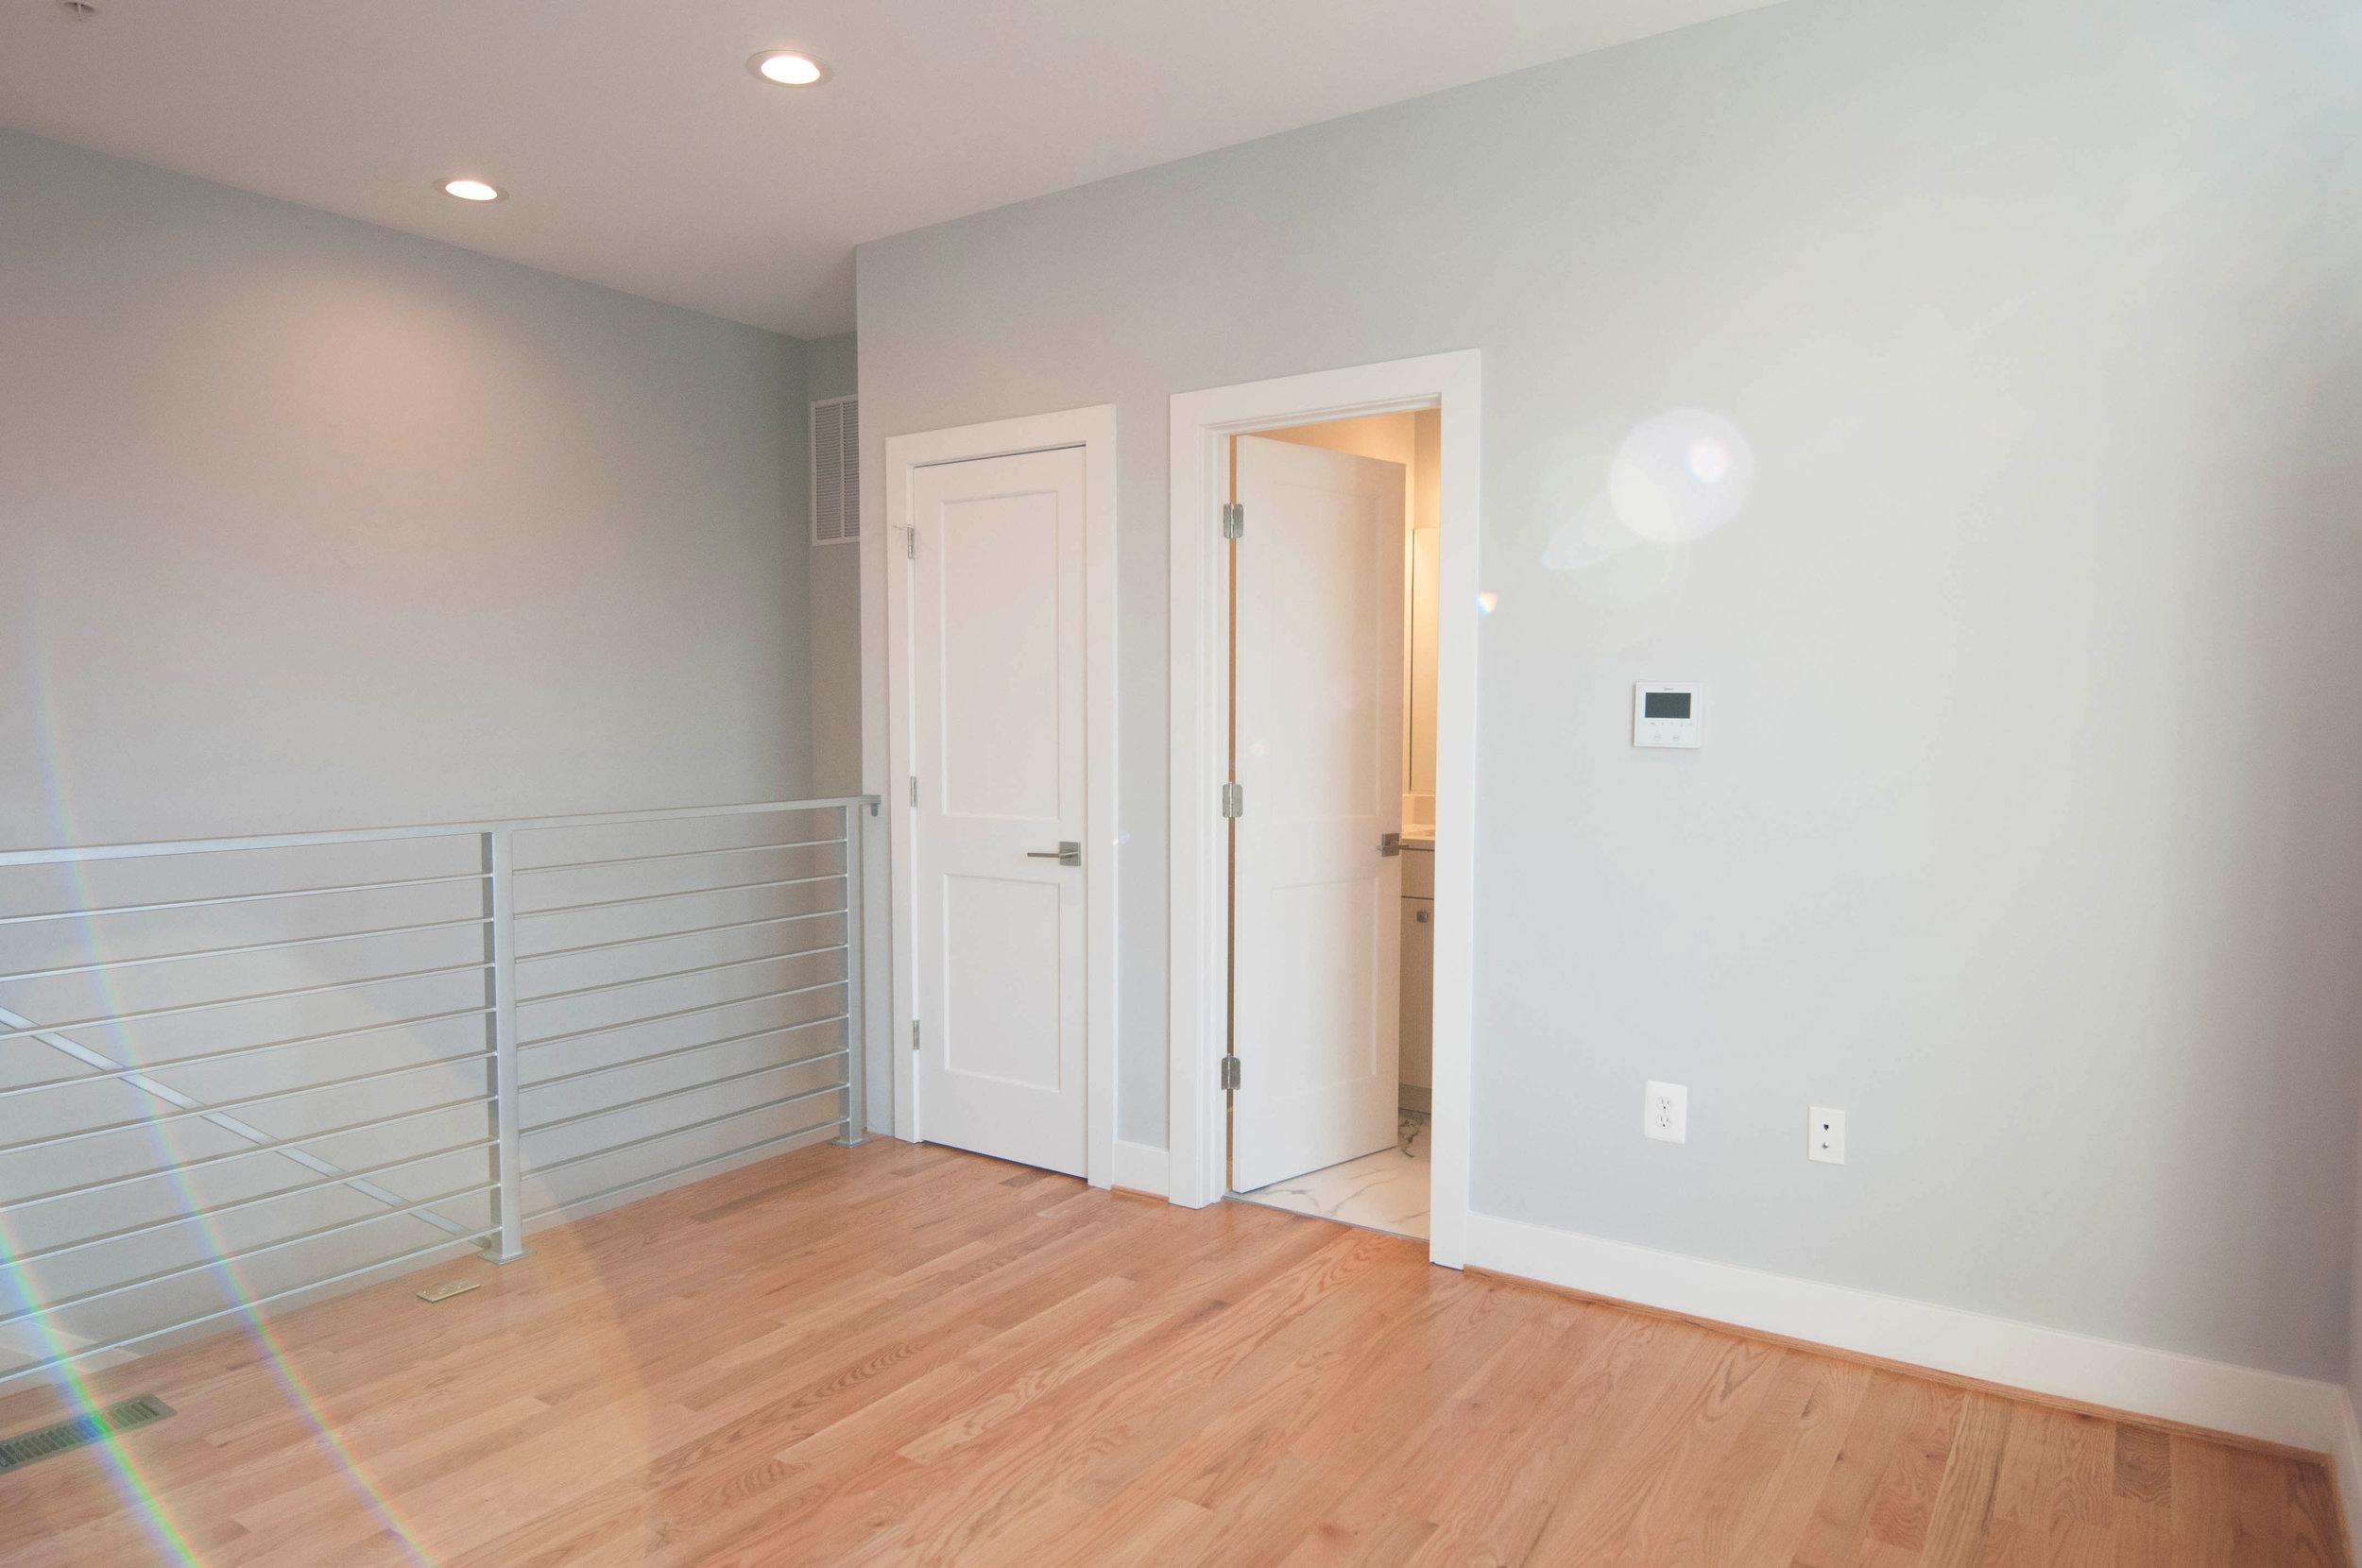 Loft + Bathroom (Unit #23)